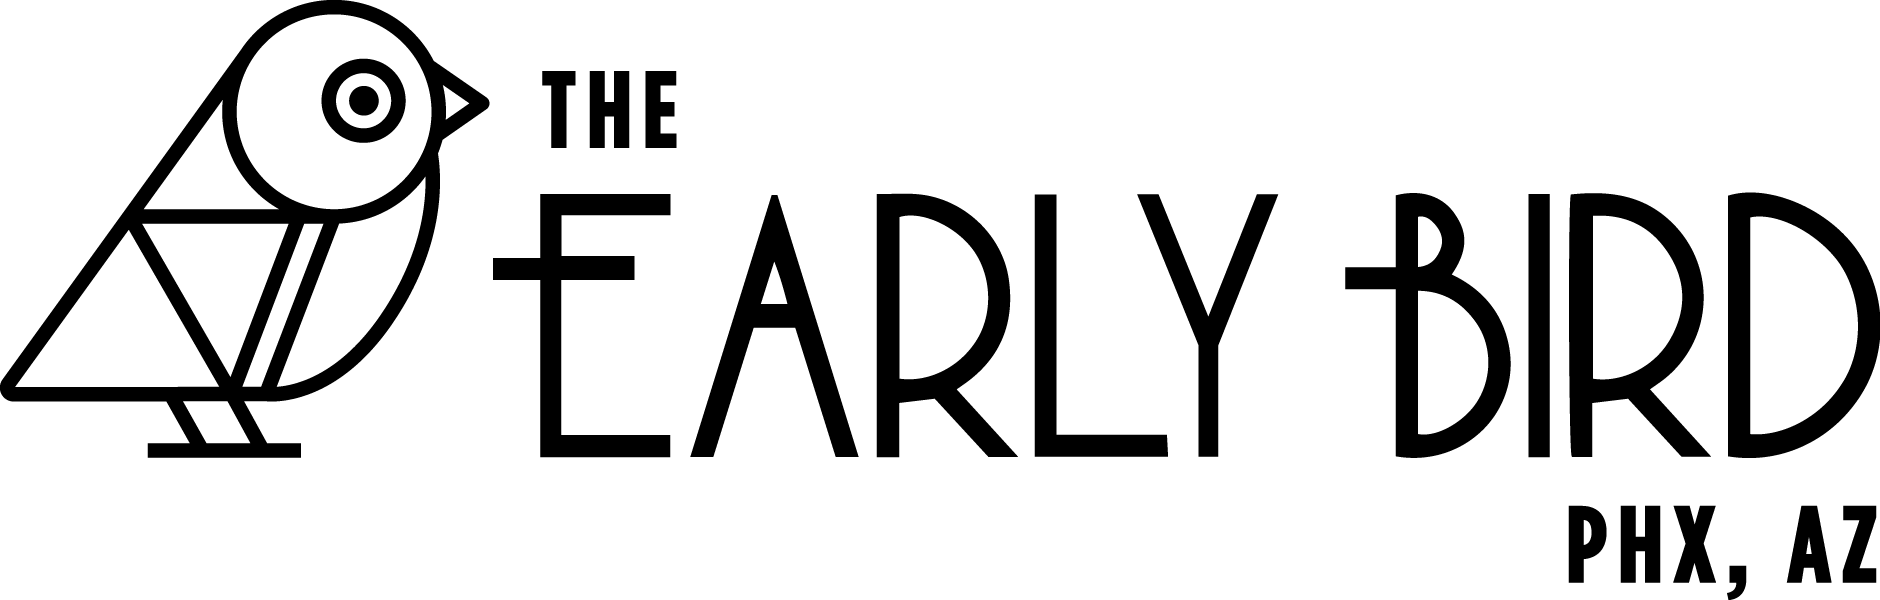 TheEarlyBird_Logo-Black.png